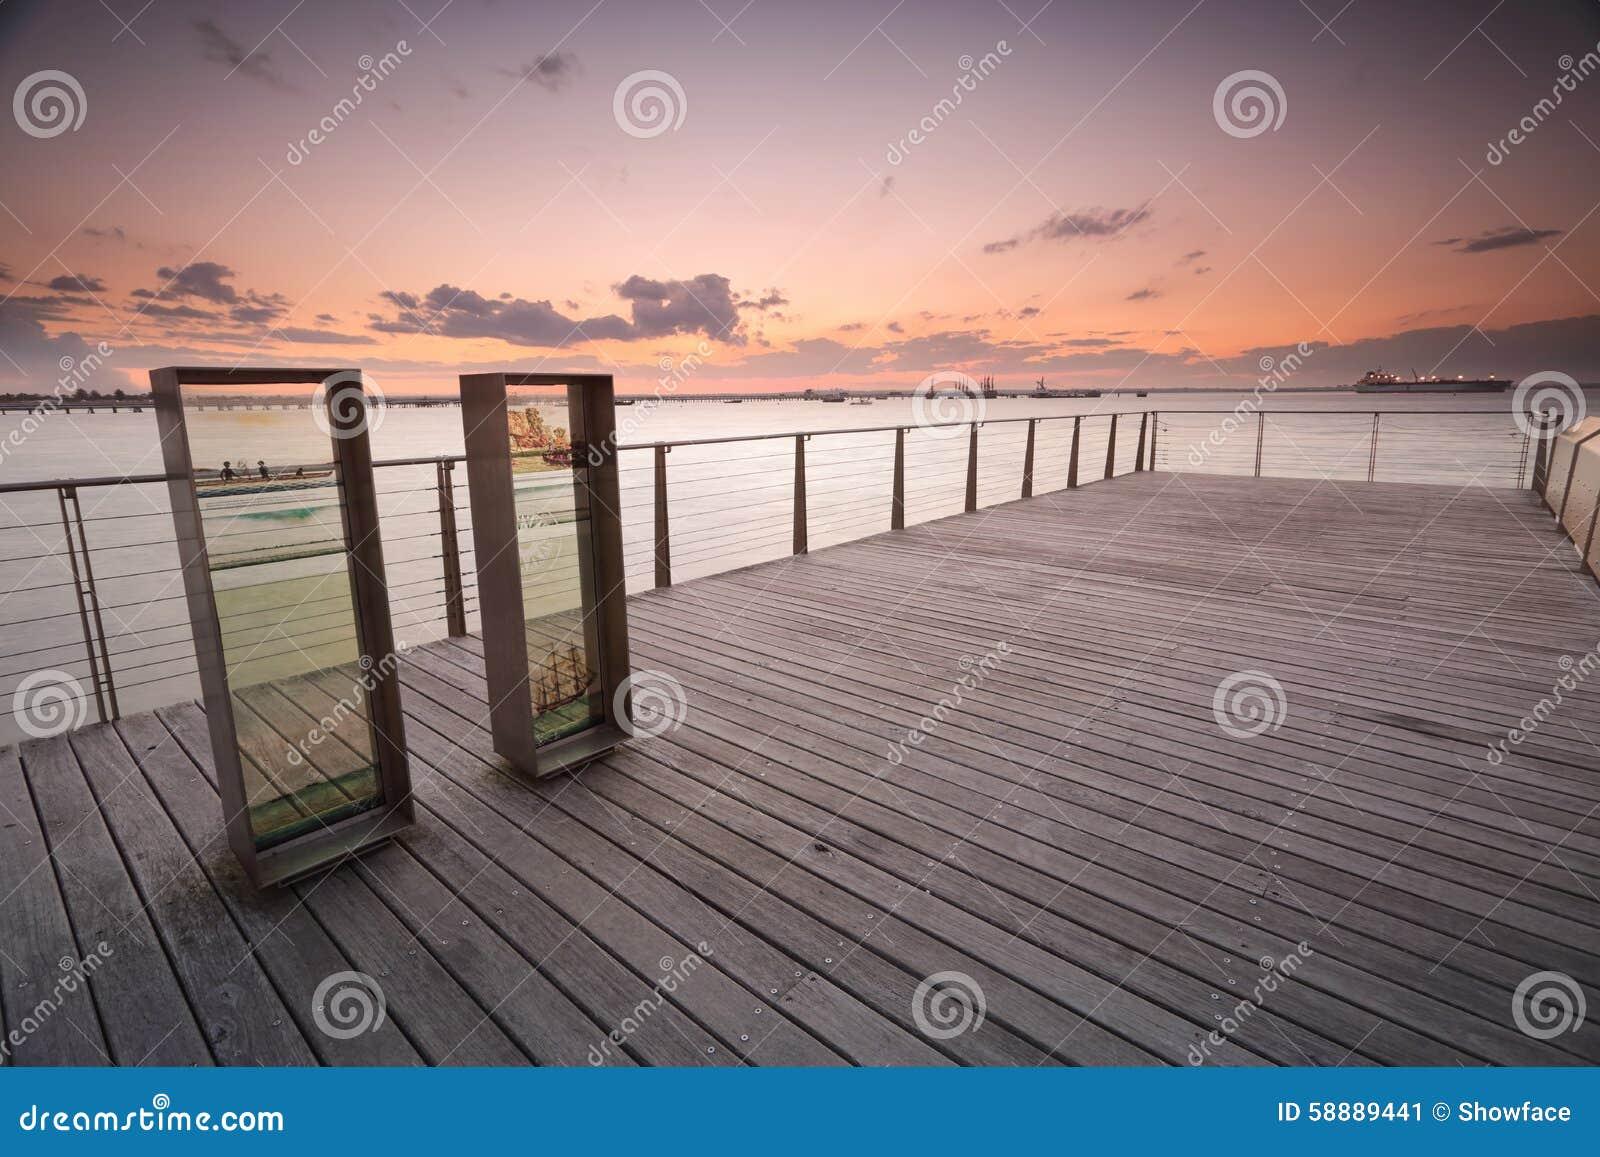 Zonsondergang over Plantkundebaai van pier